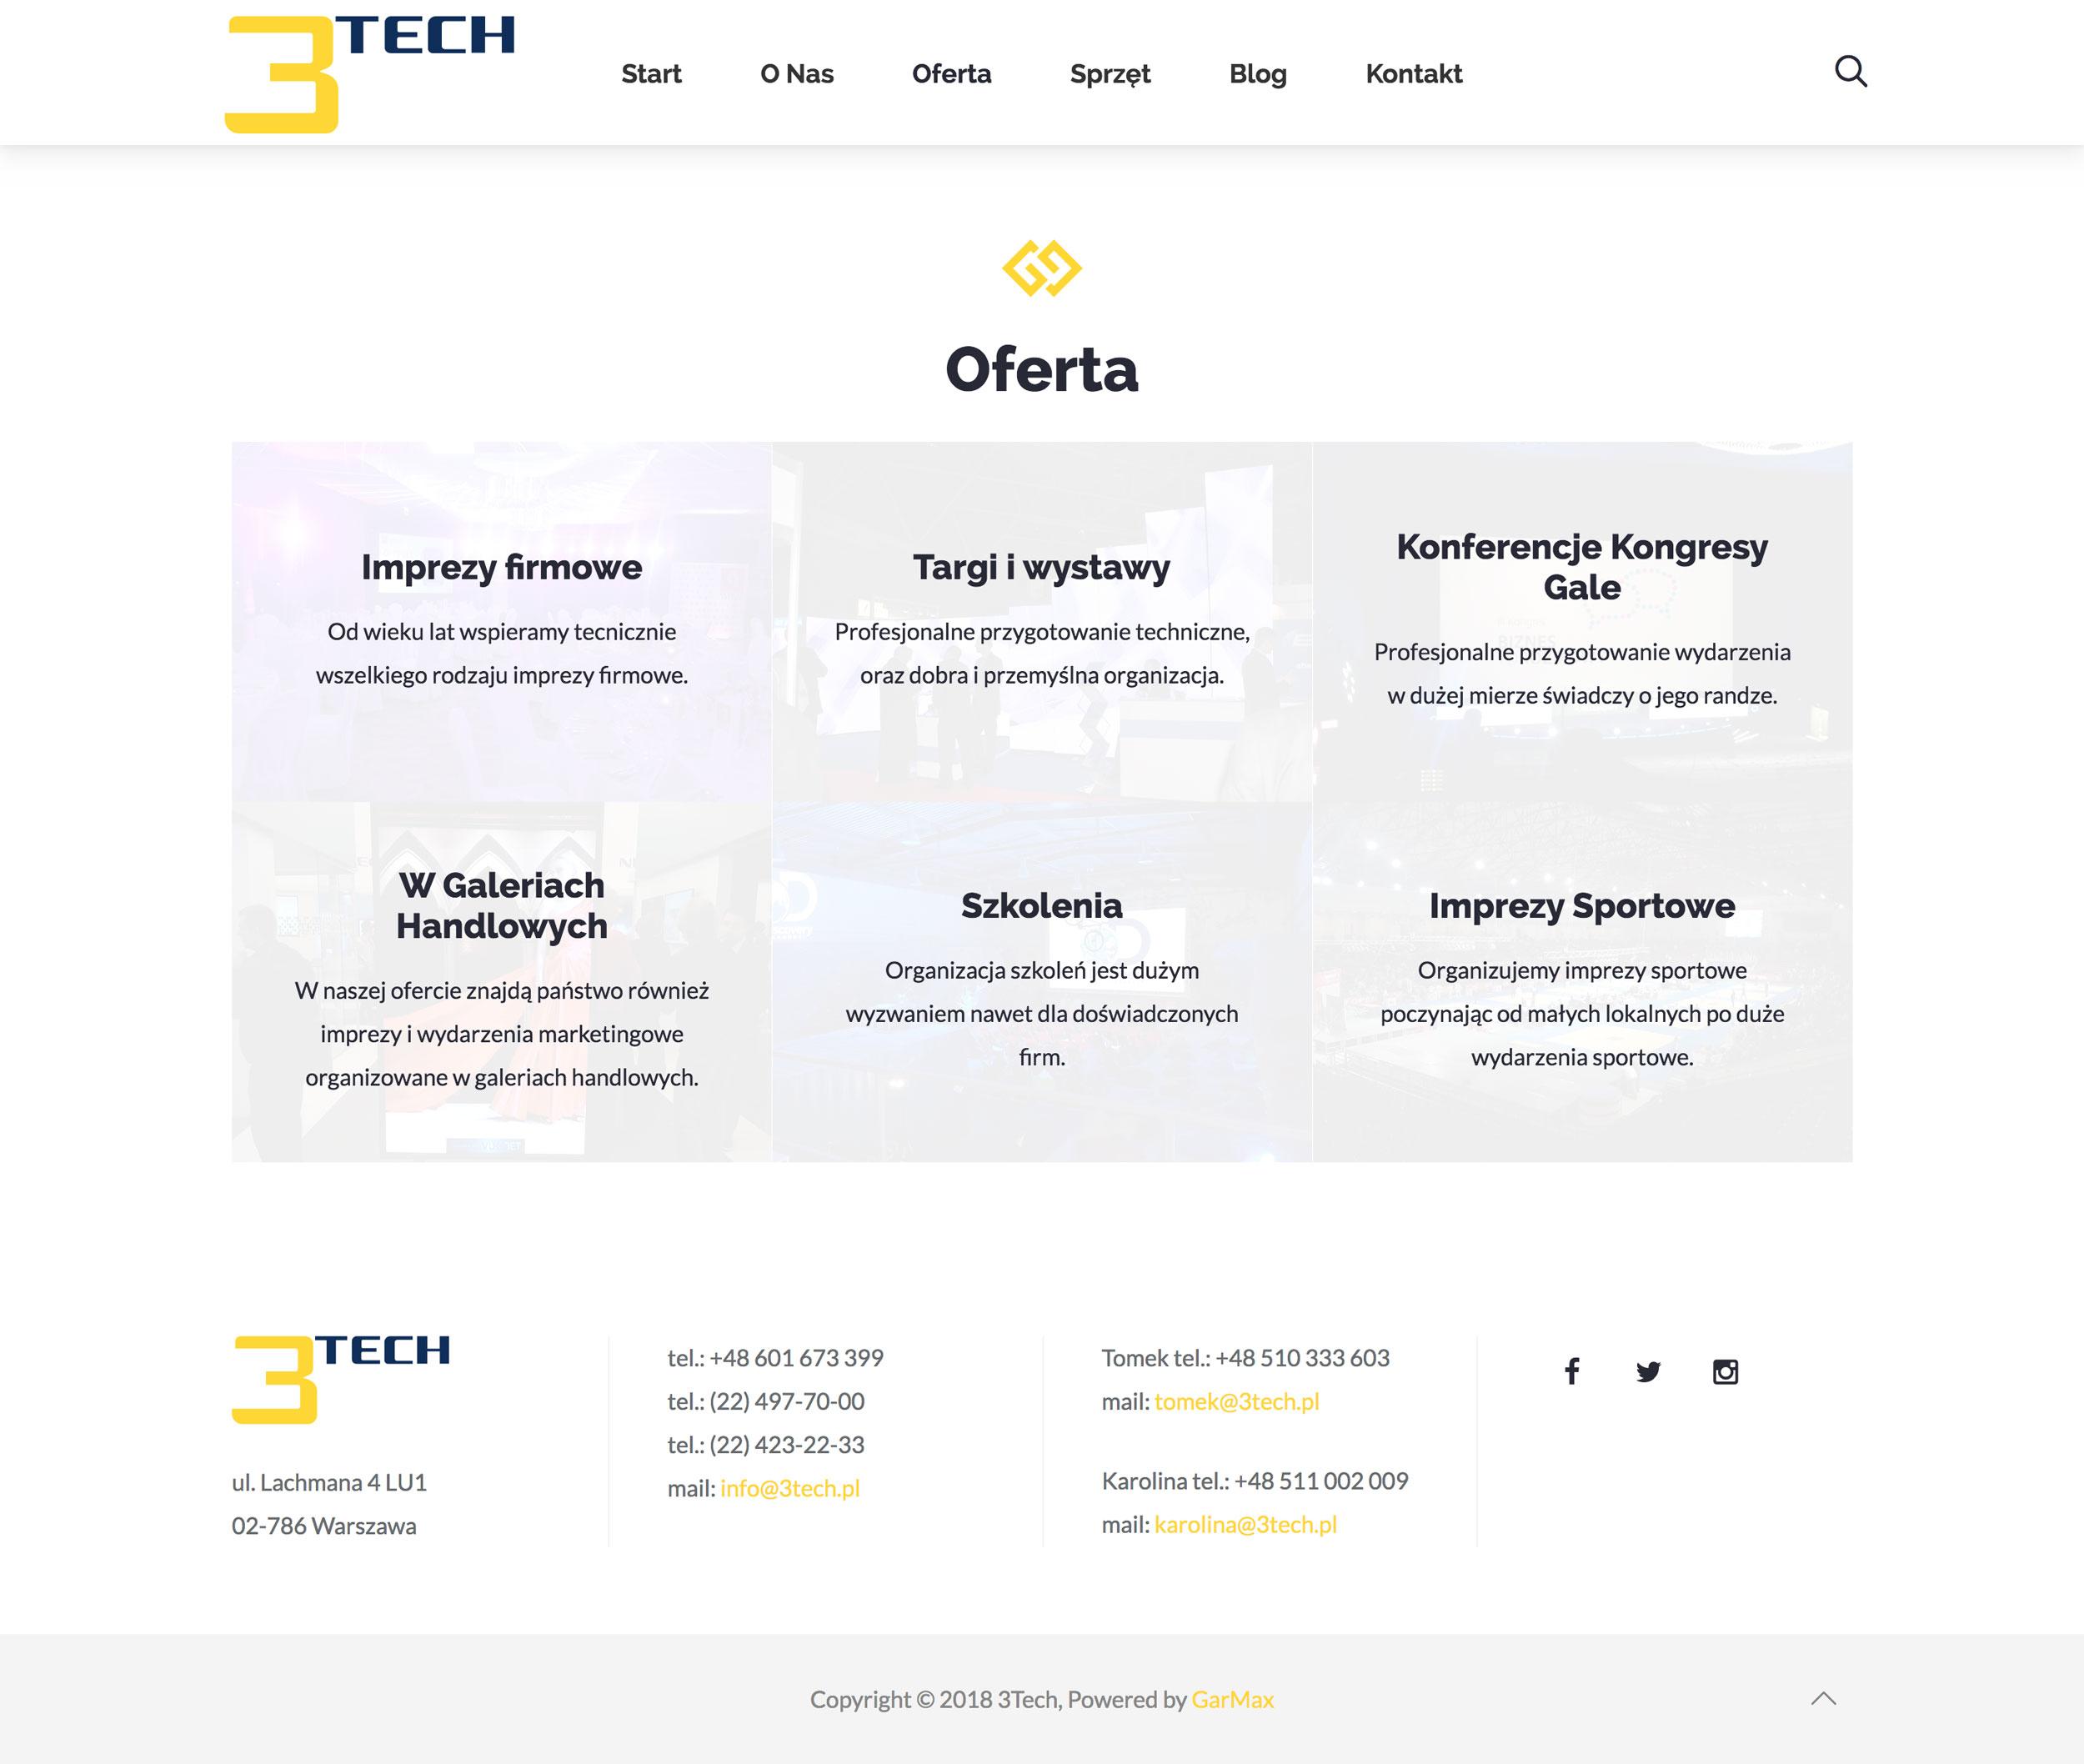 3Tech - Oferta